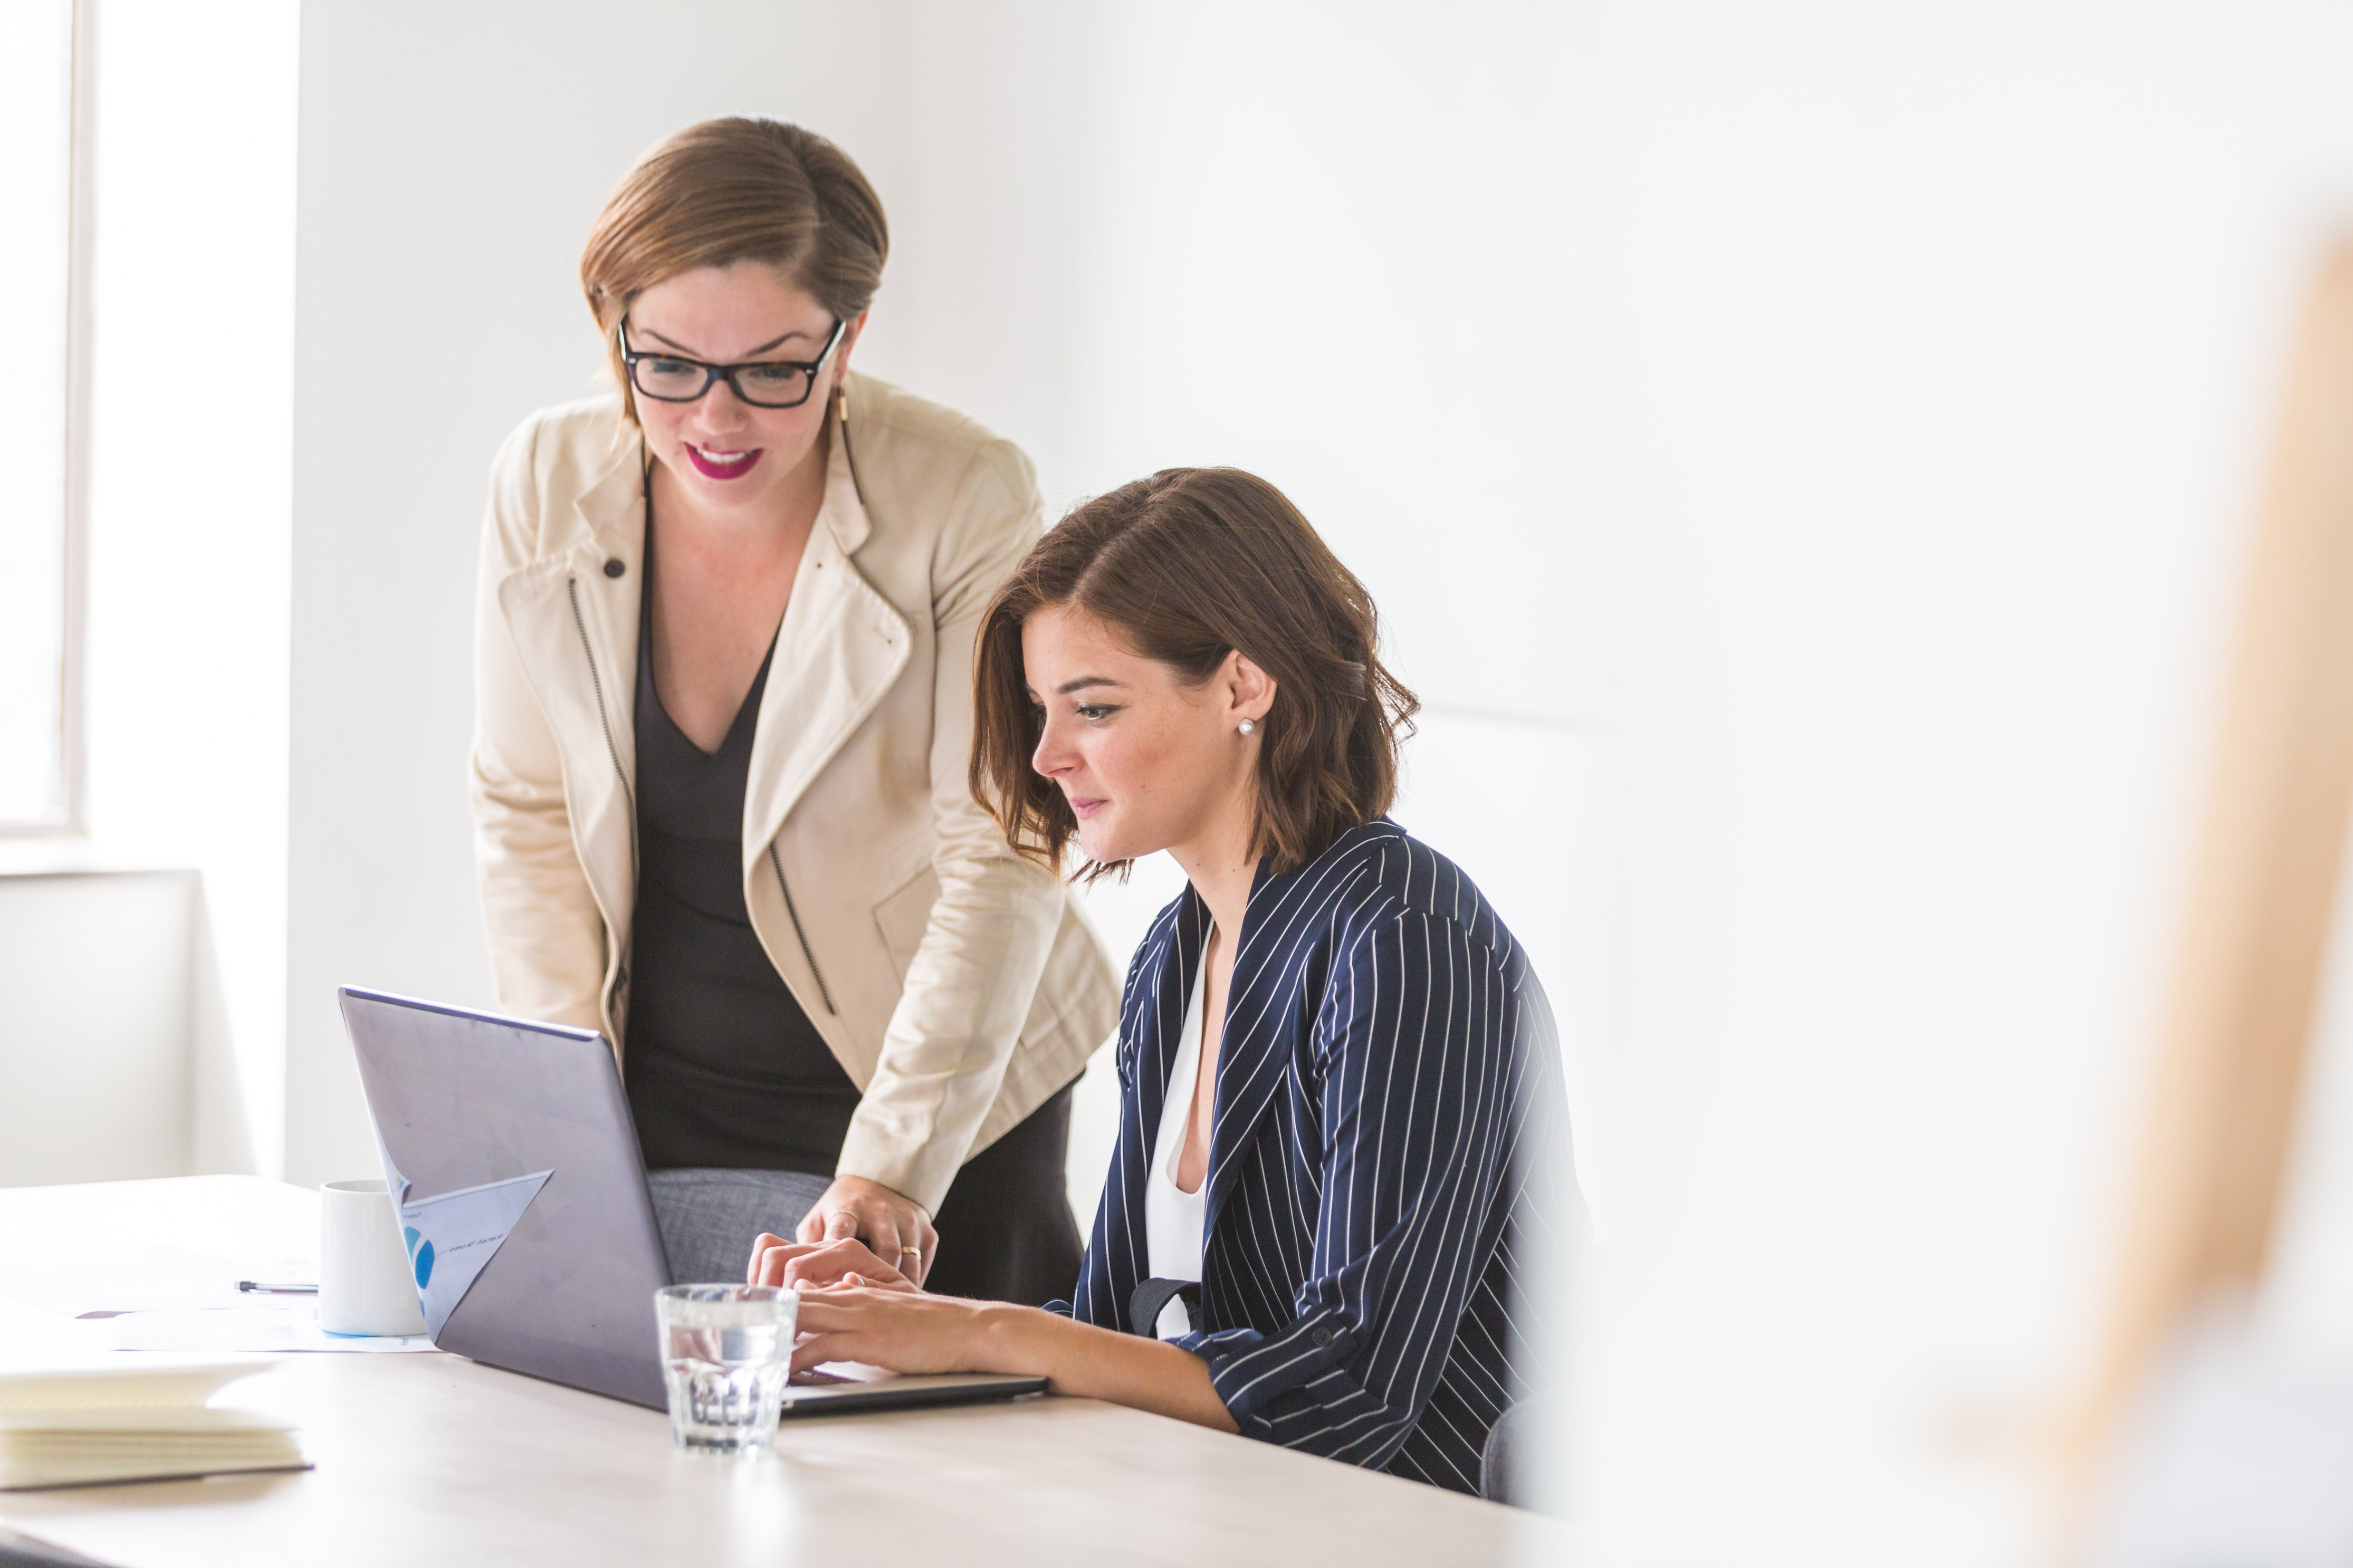 https://www.rencenter.org/wp-content/uploads/2019/10/business-women-working.jpg